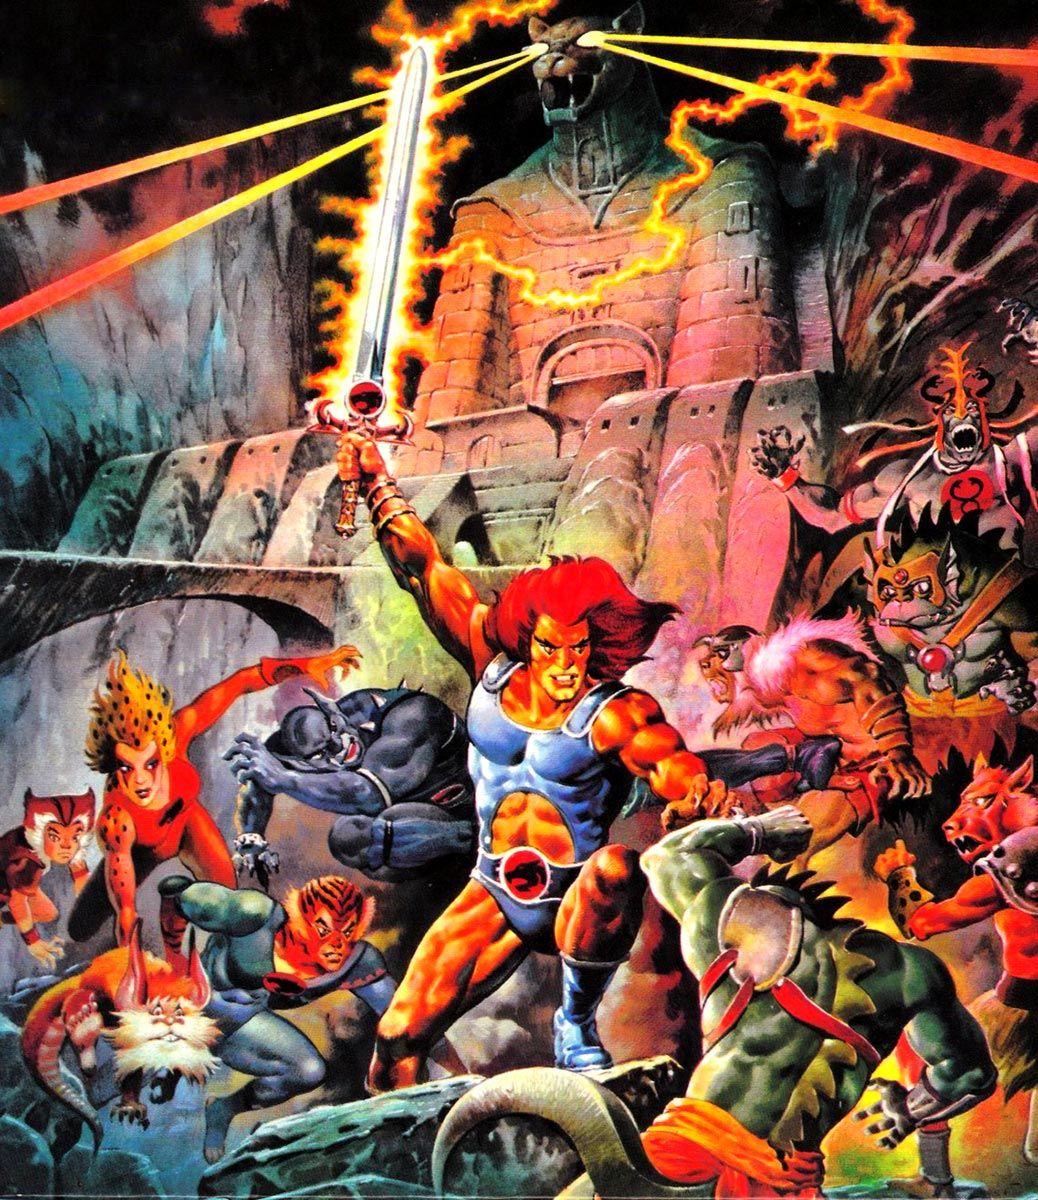 Thundercats 80s toy/cartoon artwork Cartoon artwork